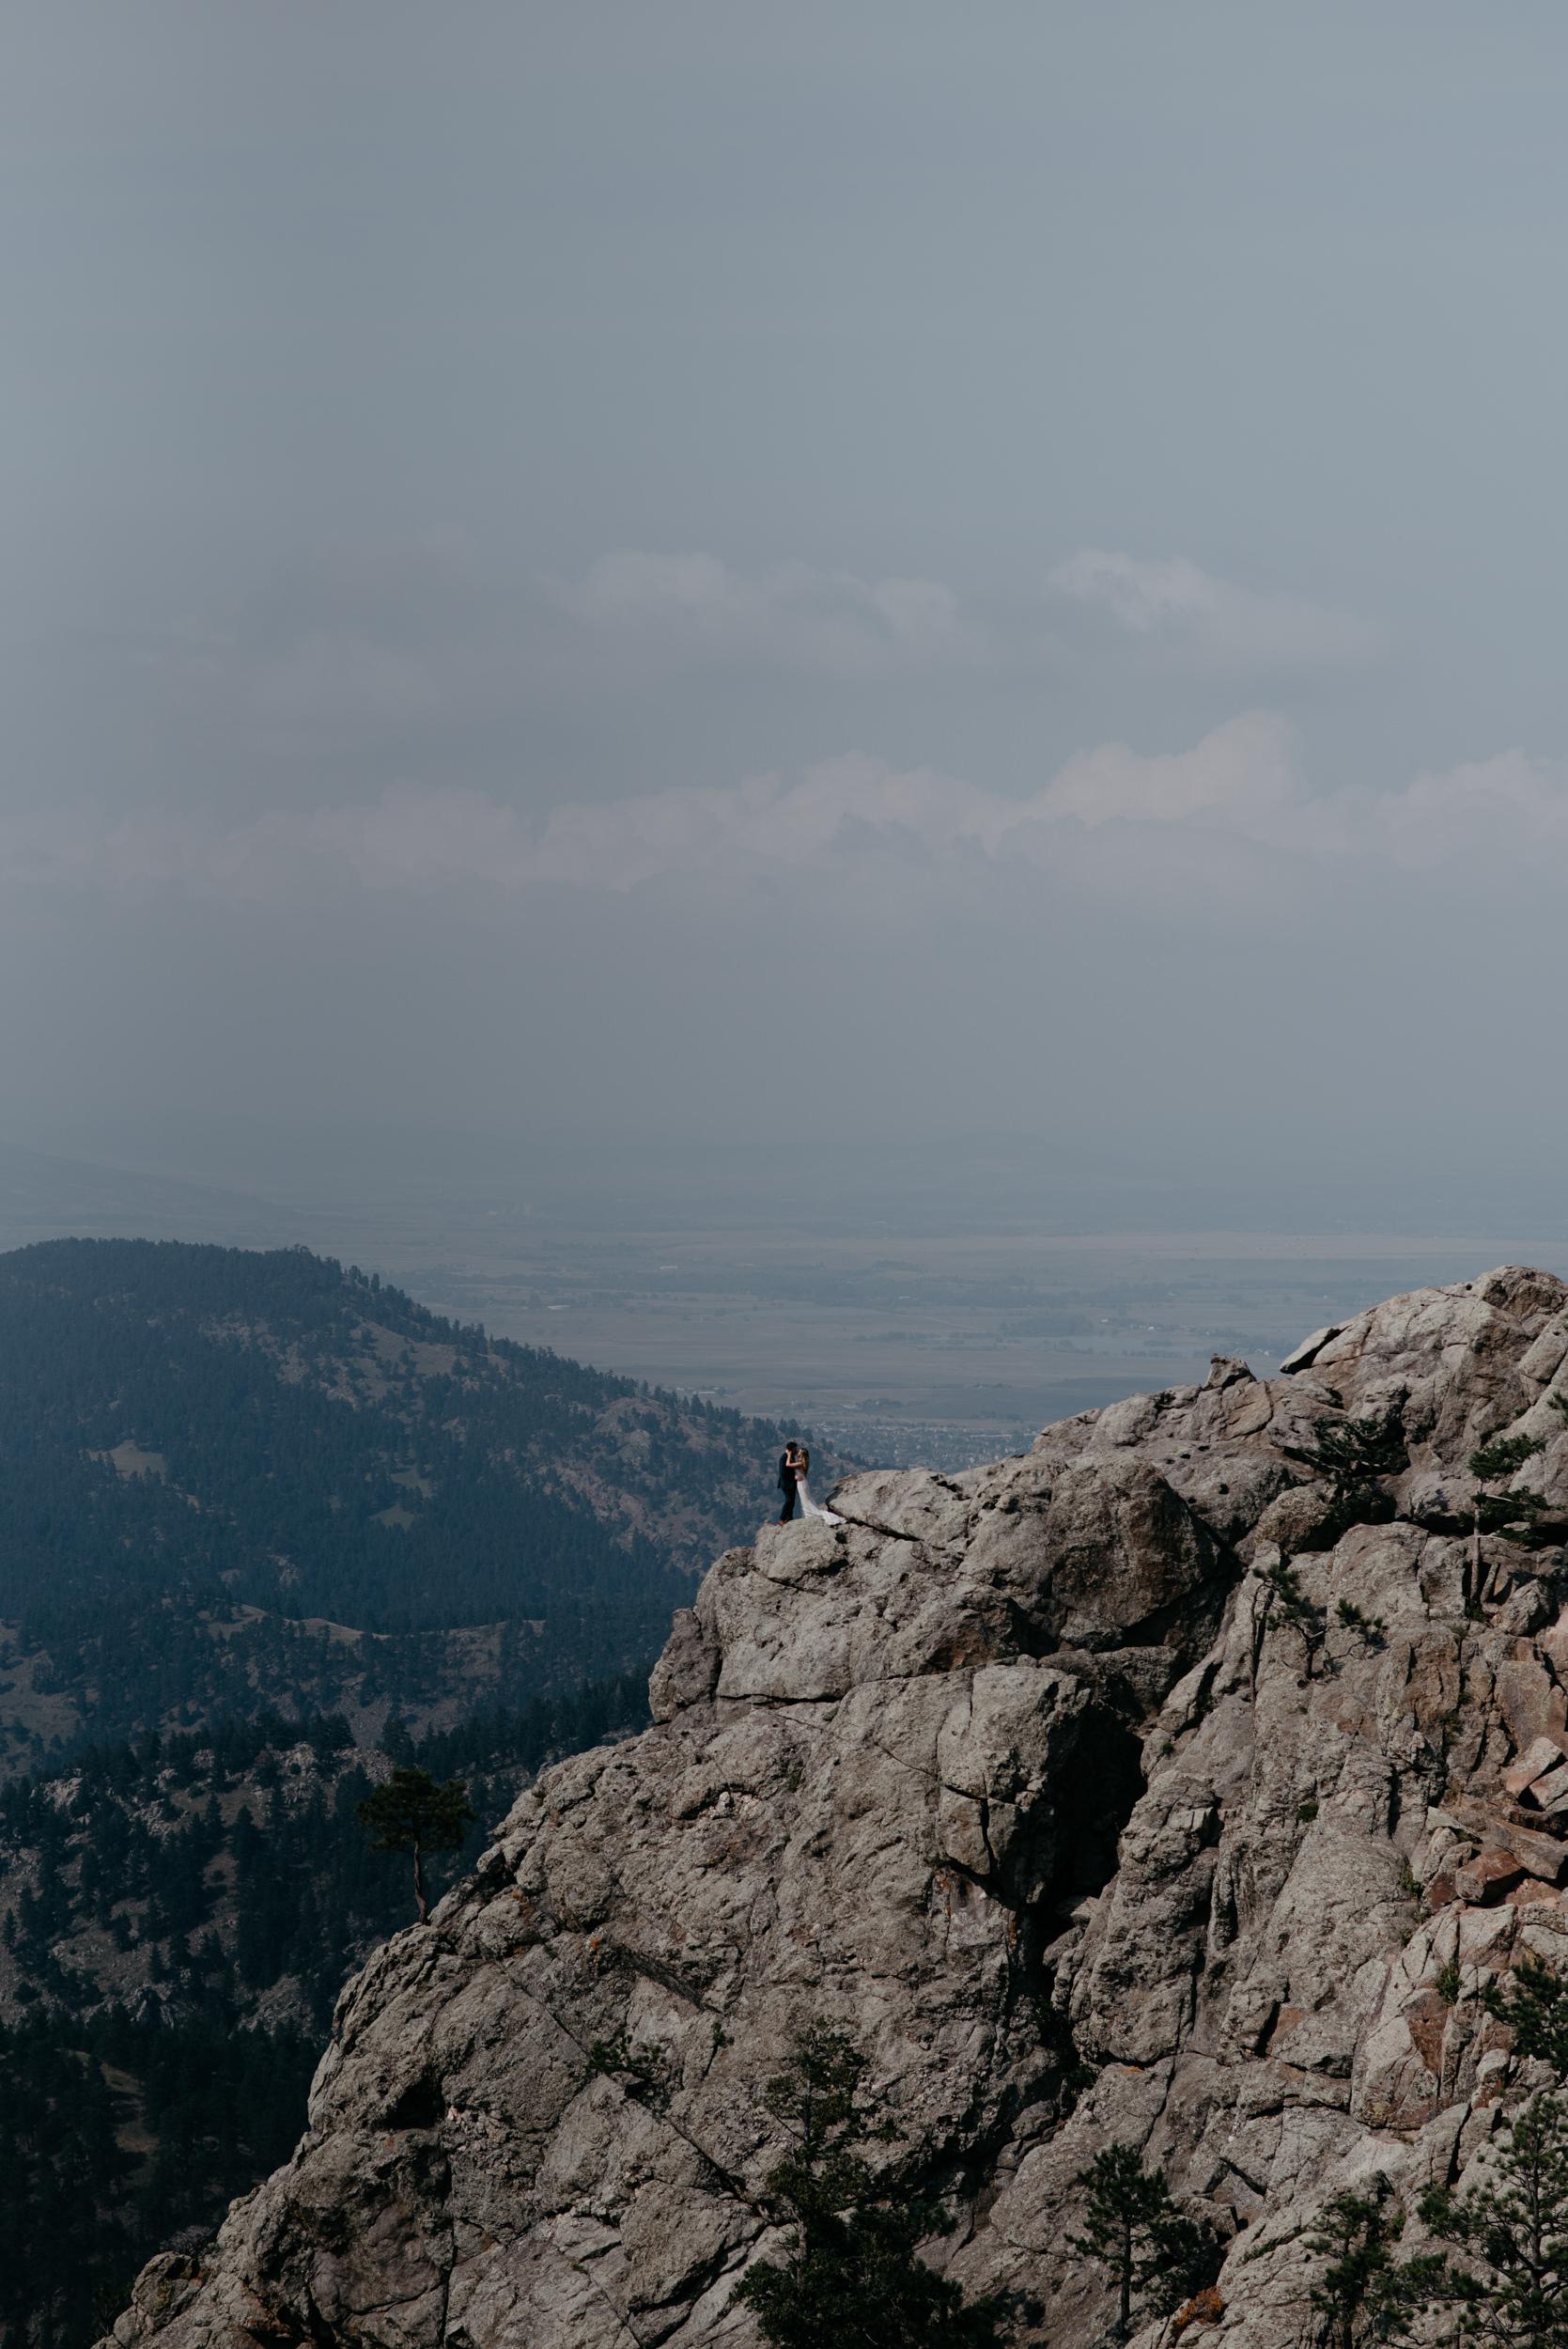 Colorado mountain elopement and wedding photographer. Adventure elopement in Boulder, Colorado.